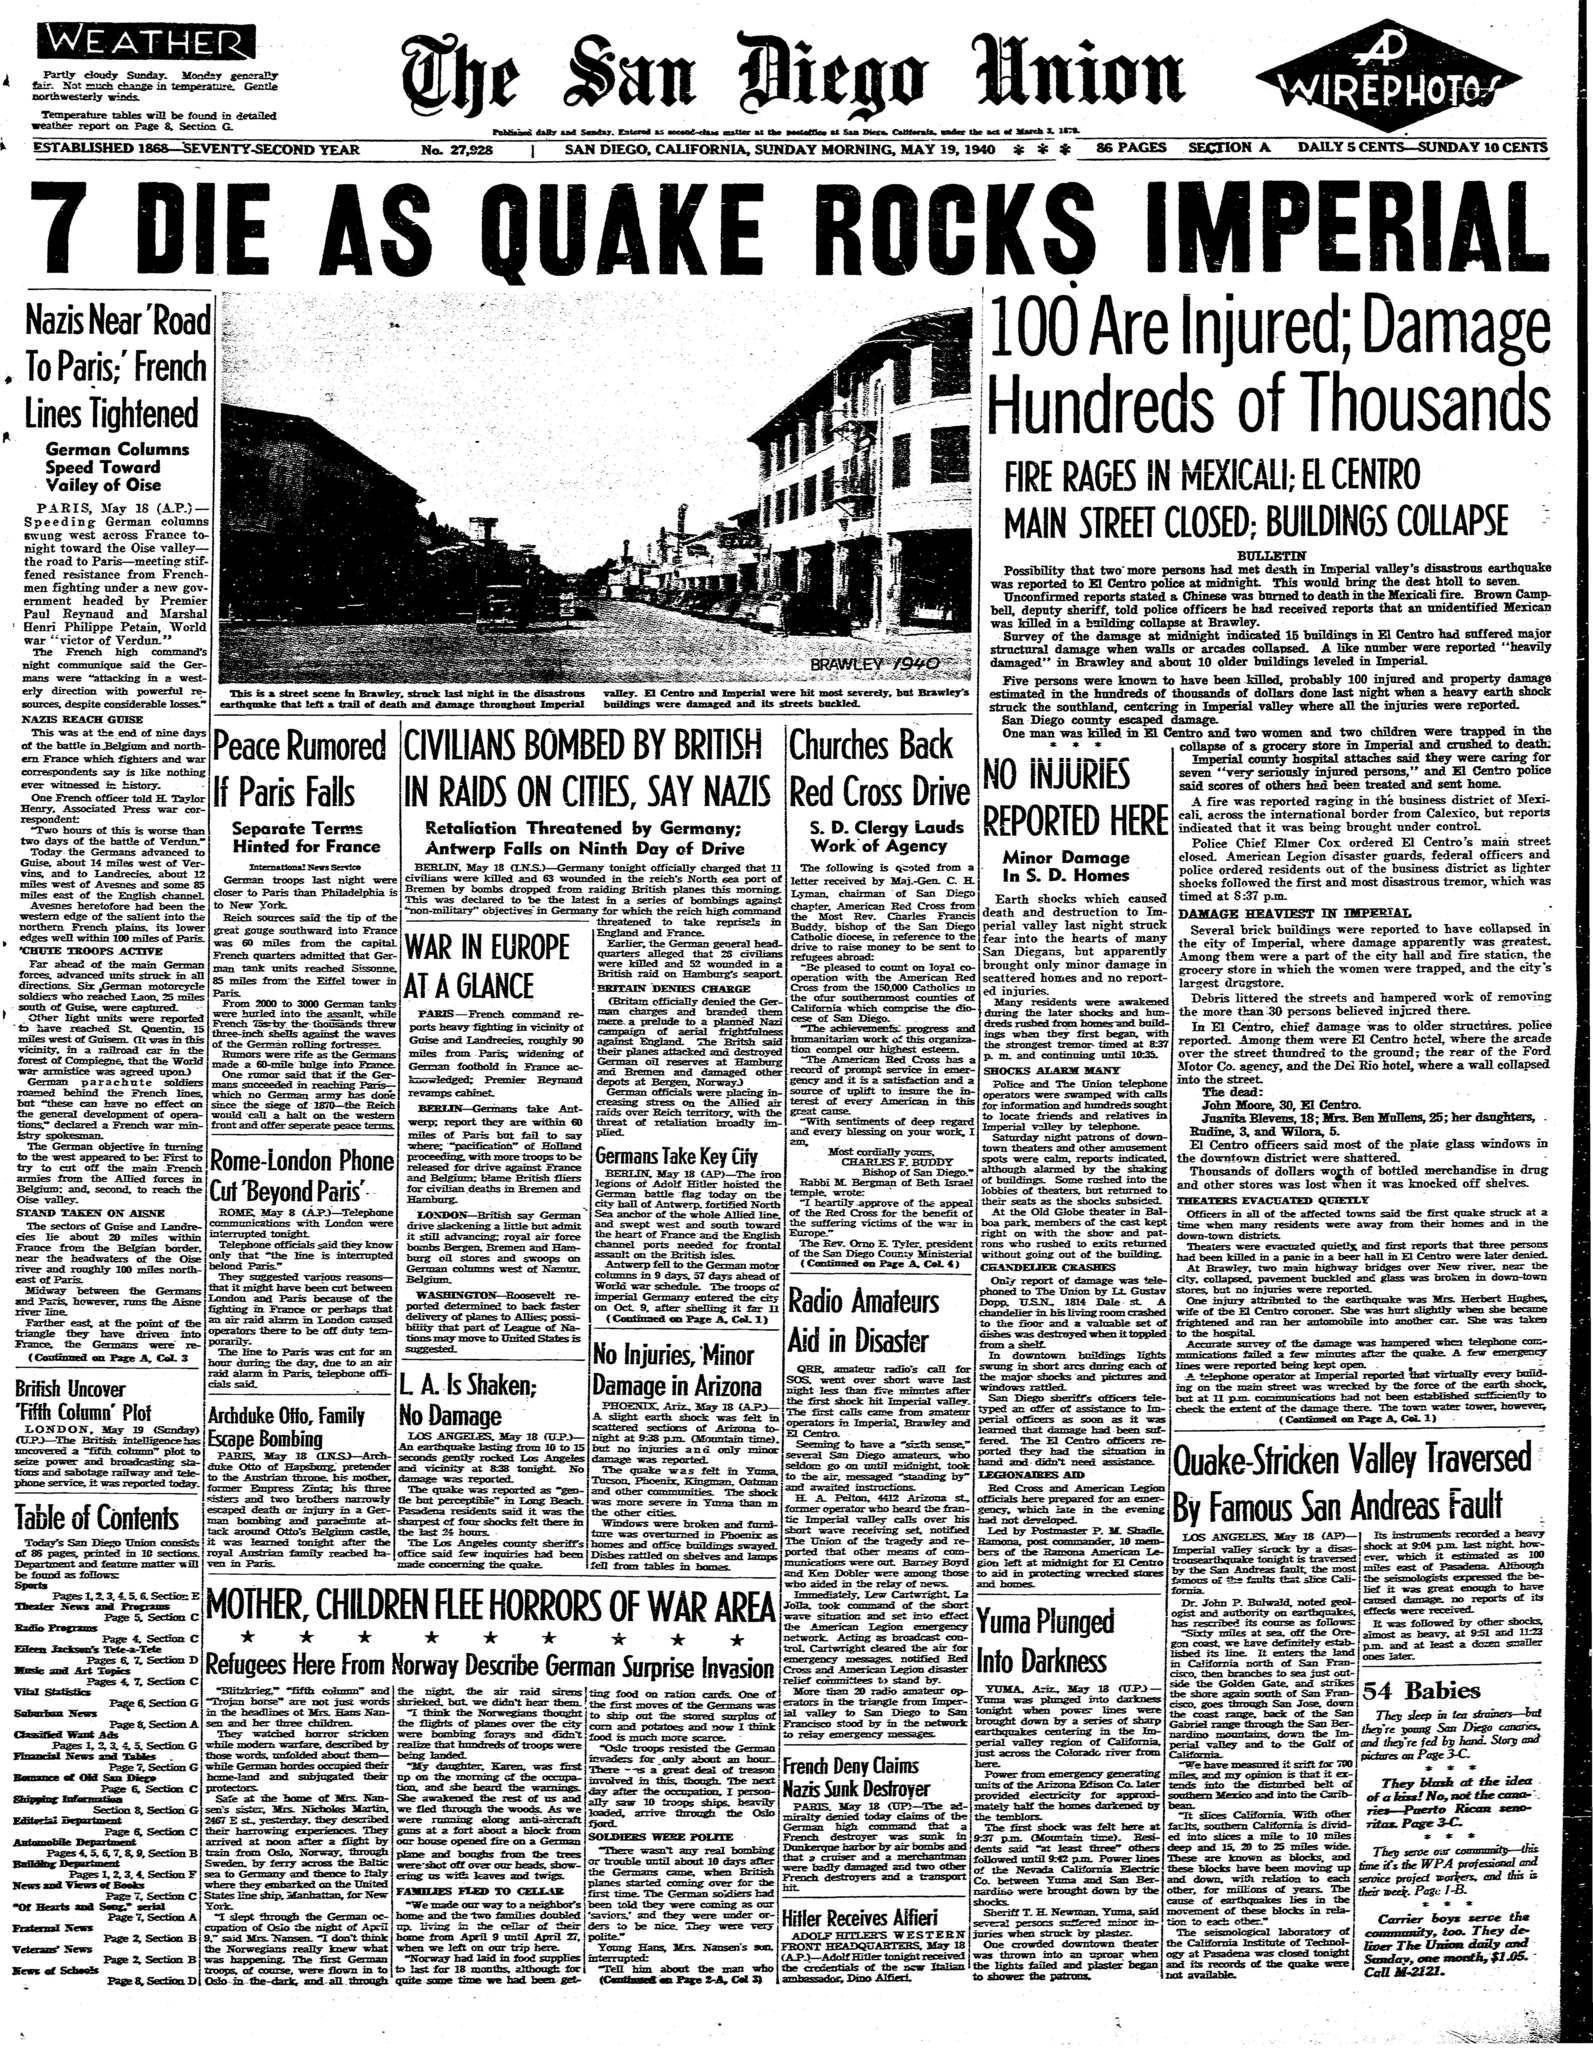 May 19 1940 Quake rocks Imperial The San Diego Union Tribune